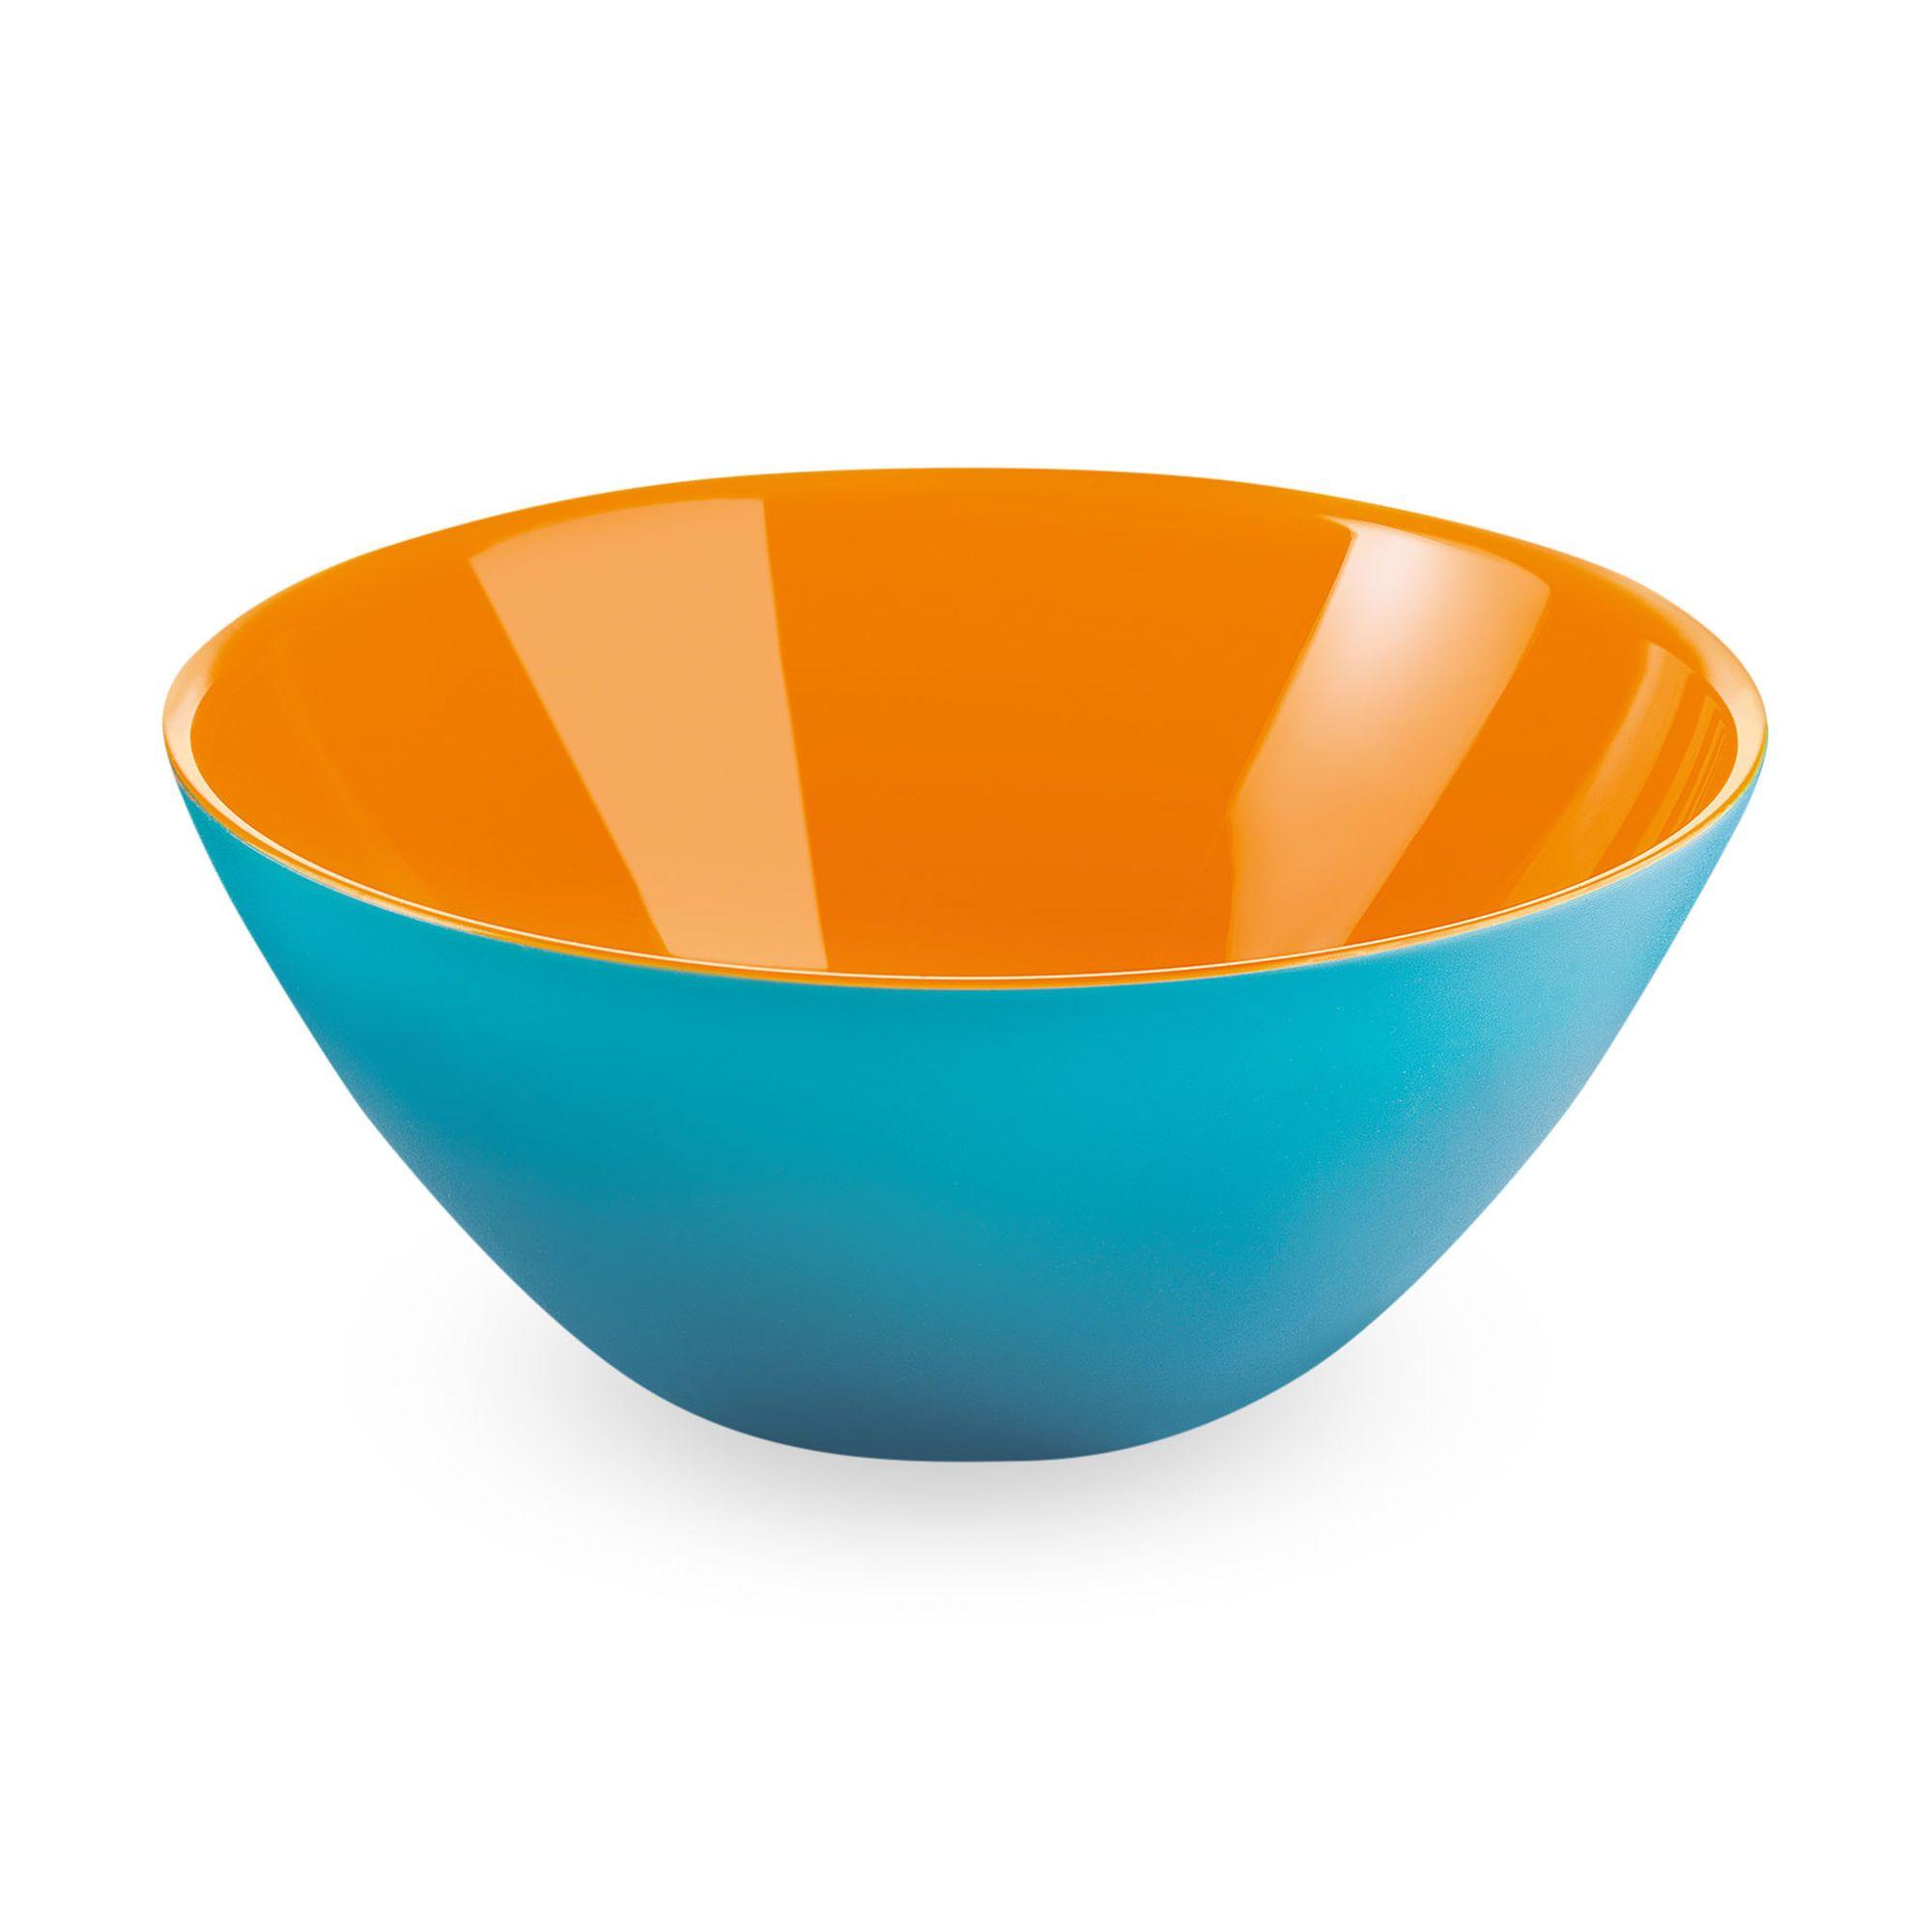 My Fusion Bowls In Color Coral Sea Blue